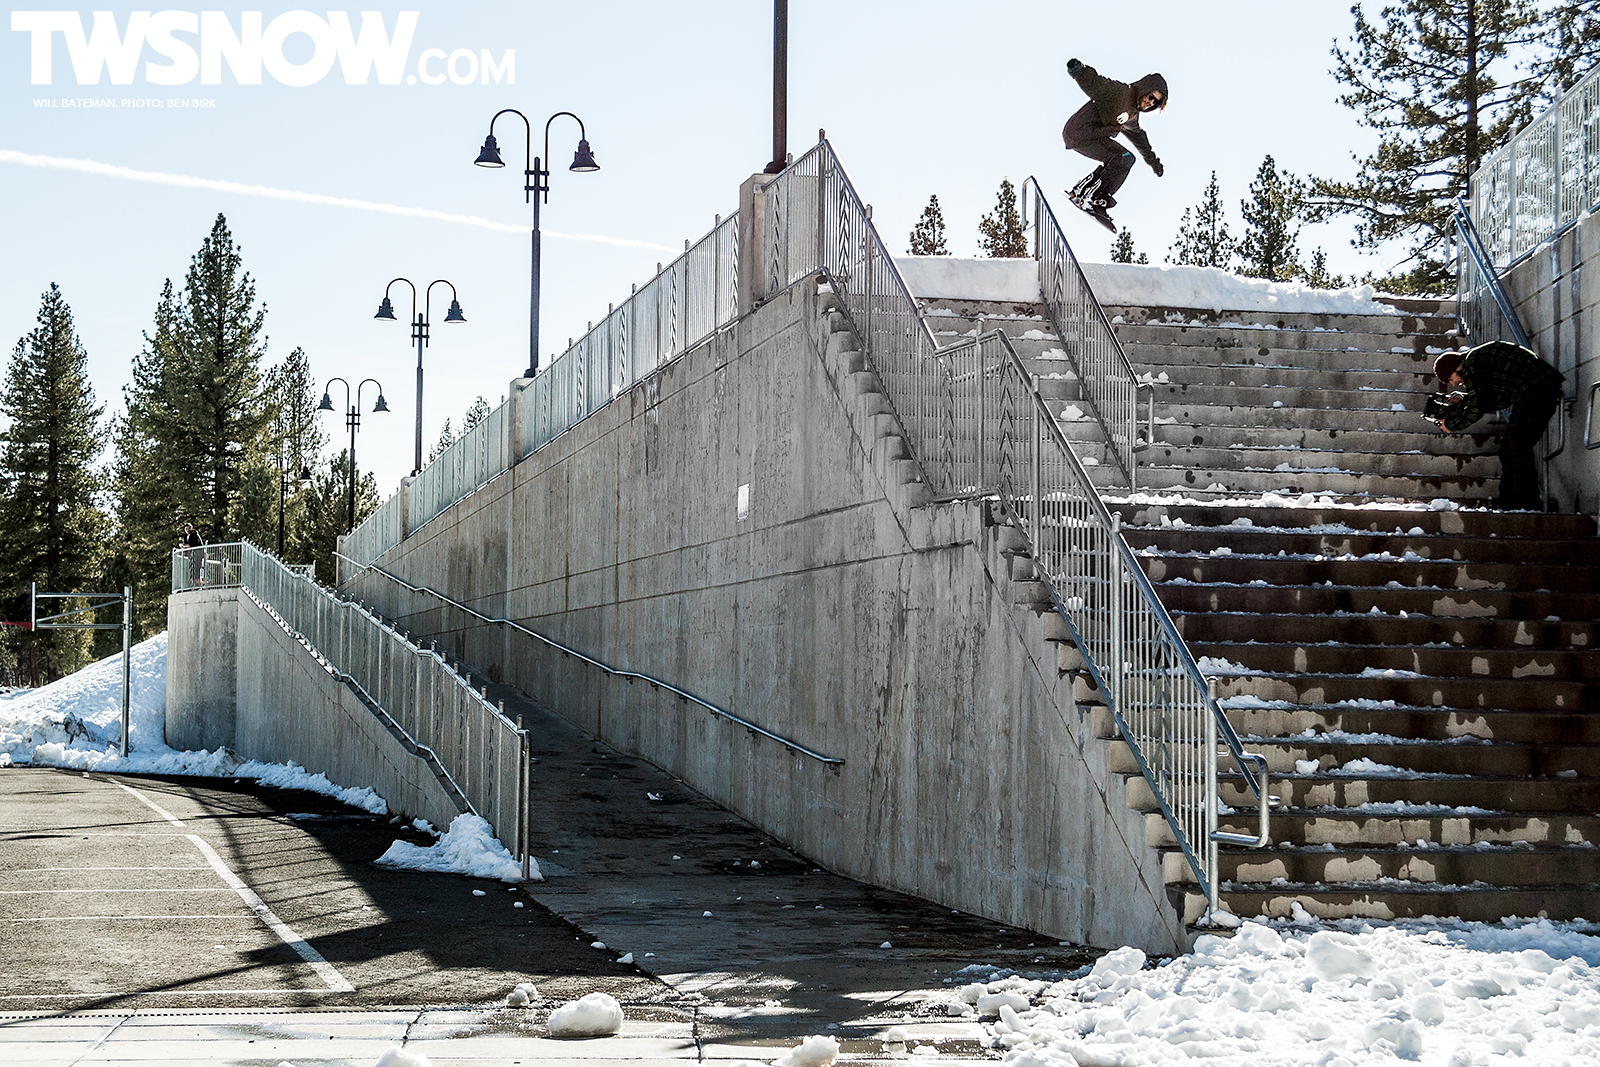 Transworld Skateboarding Wallpaper Wednesday Wallpaper wednesday 1600x1067